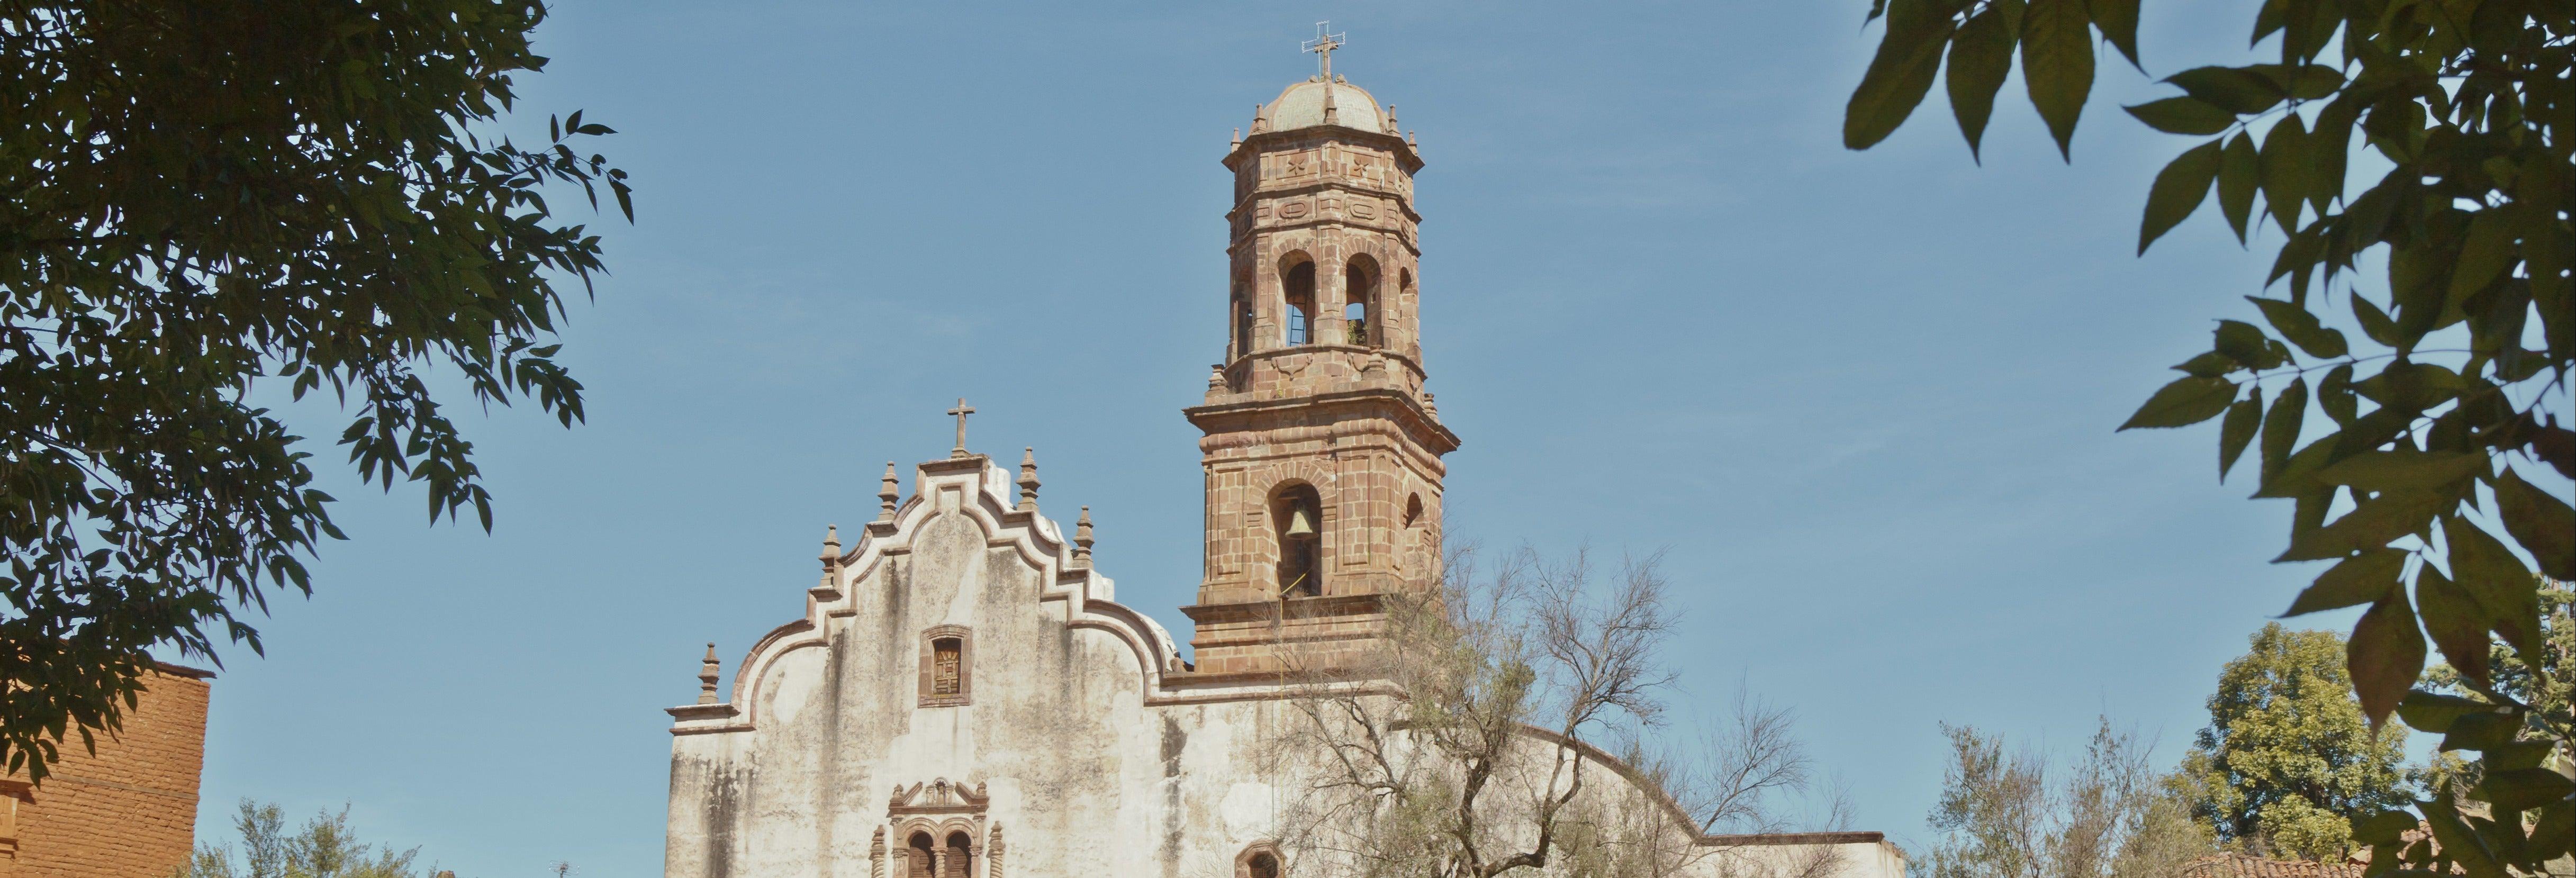 Tzintzuntzan, Santa Fe de la Laguna y San Jerónimo Purenchécuaro